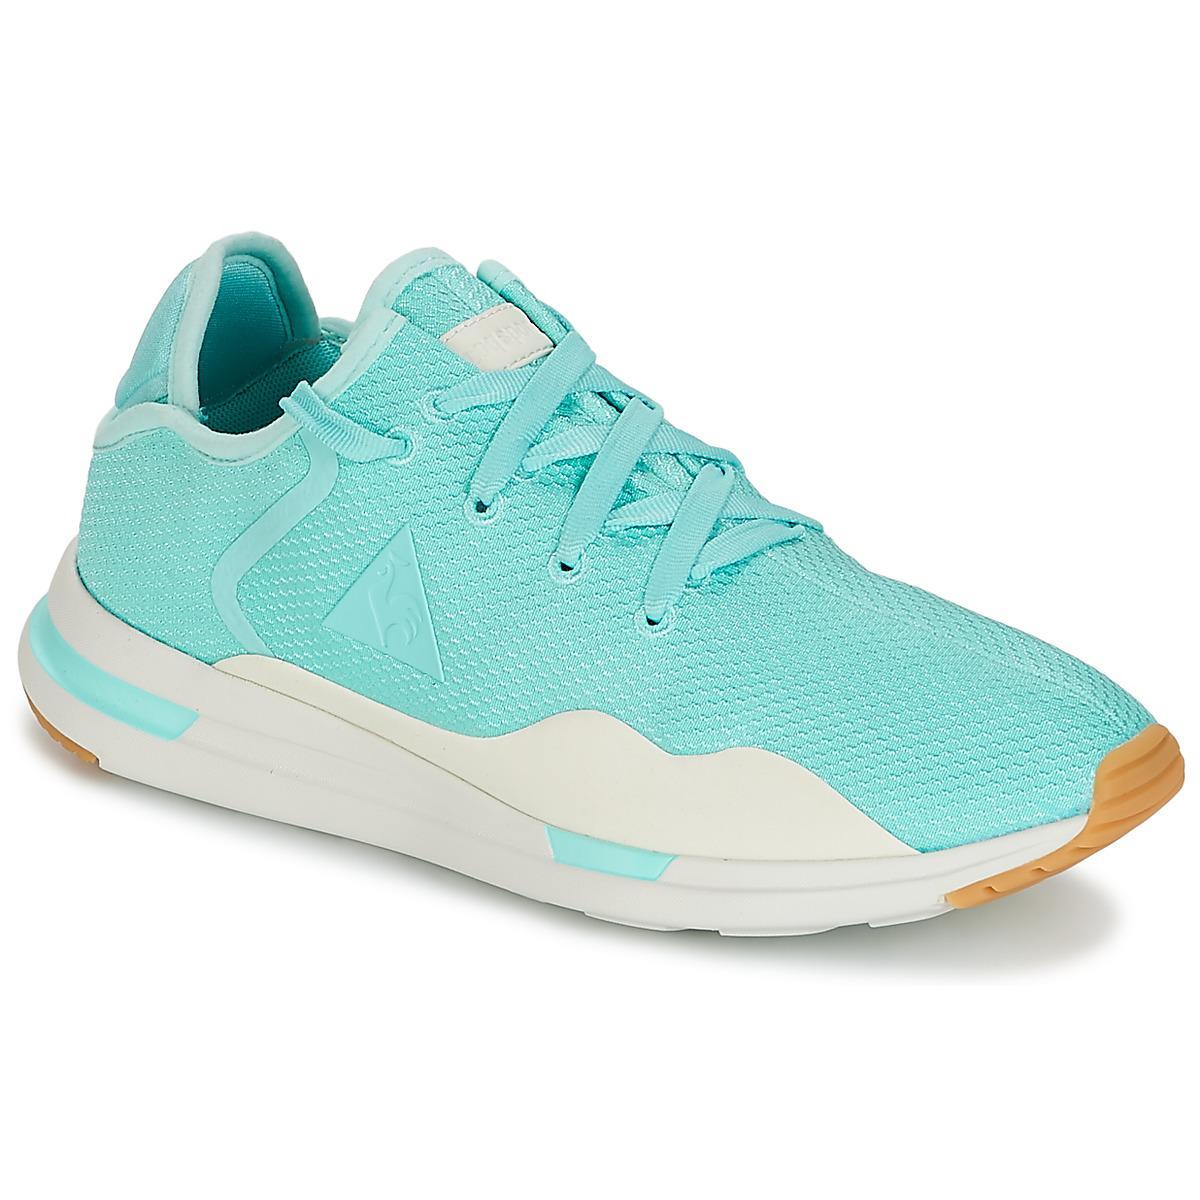 e000a0b9fe7 le coq sportif womens shoes blue sky blue